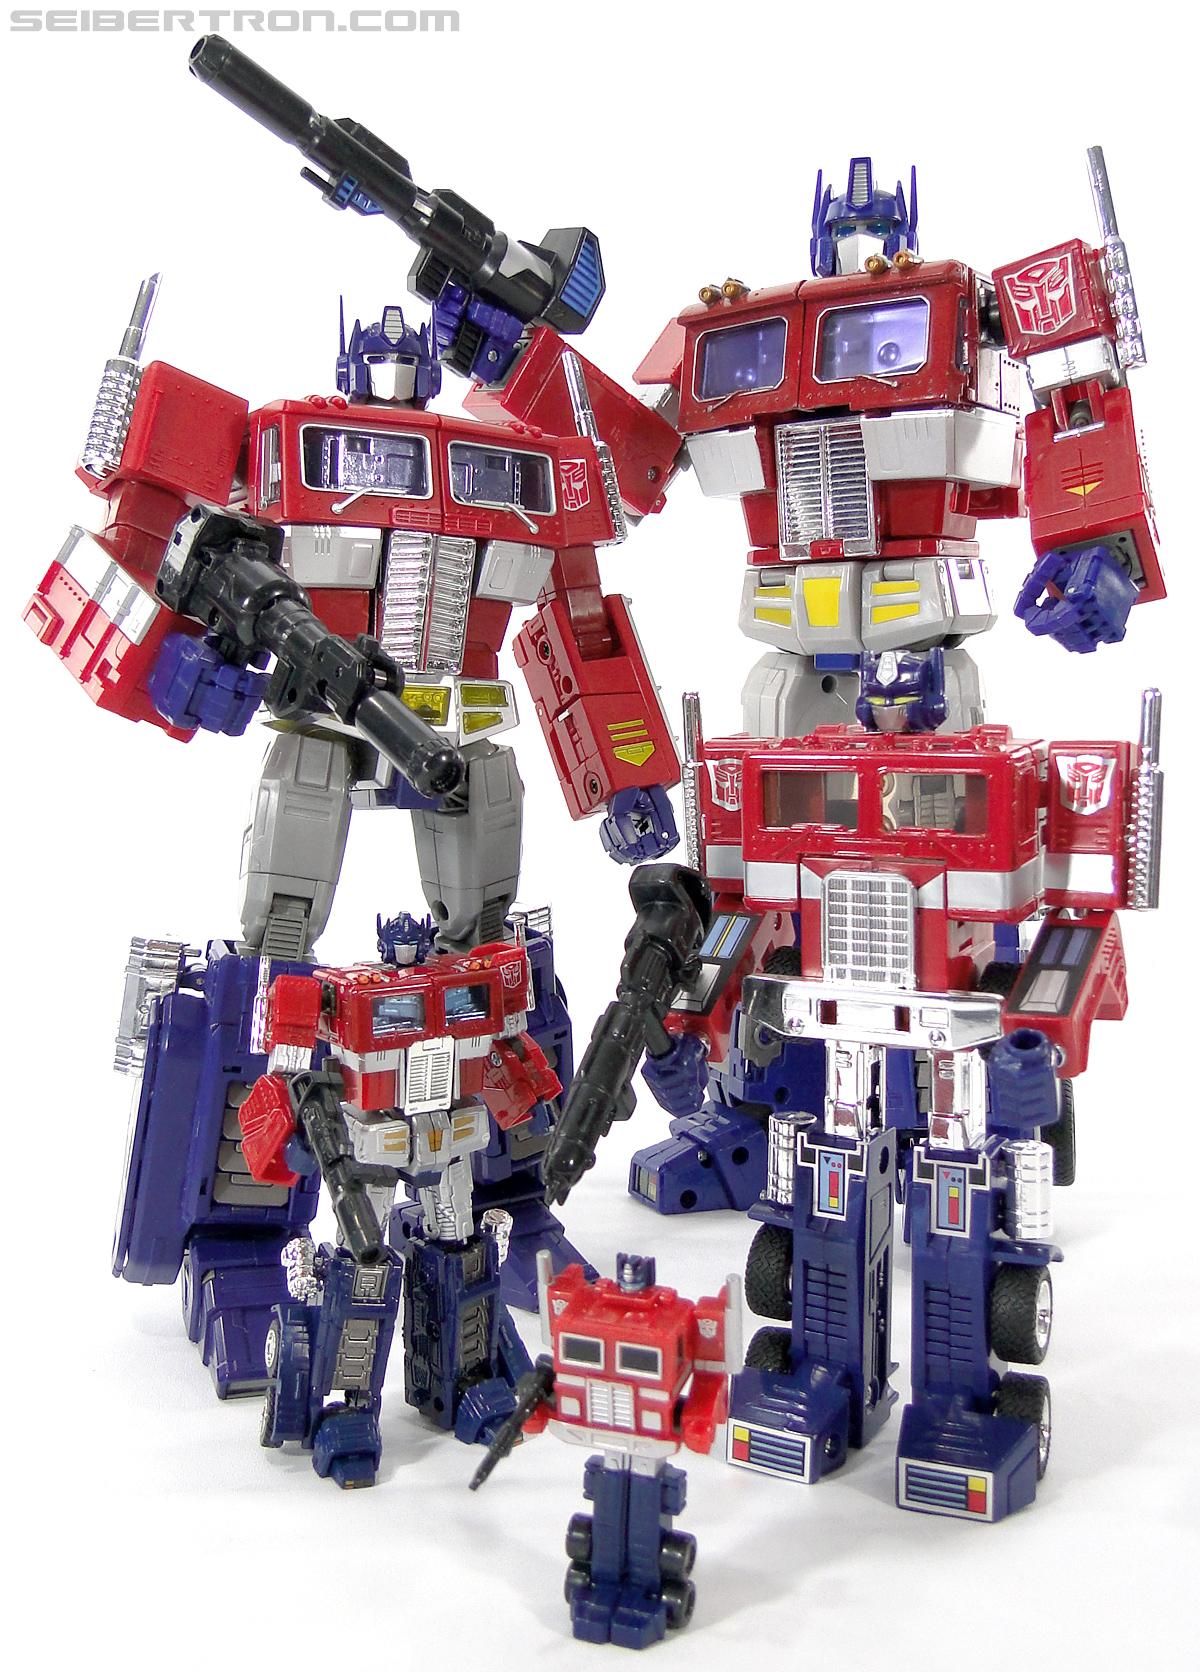 Transformers Masterpiece Optimus Prime (MP-10) (Convoy) (Image #420 of 429)